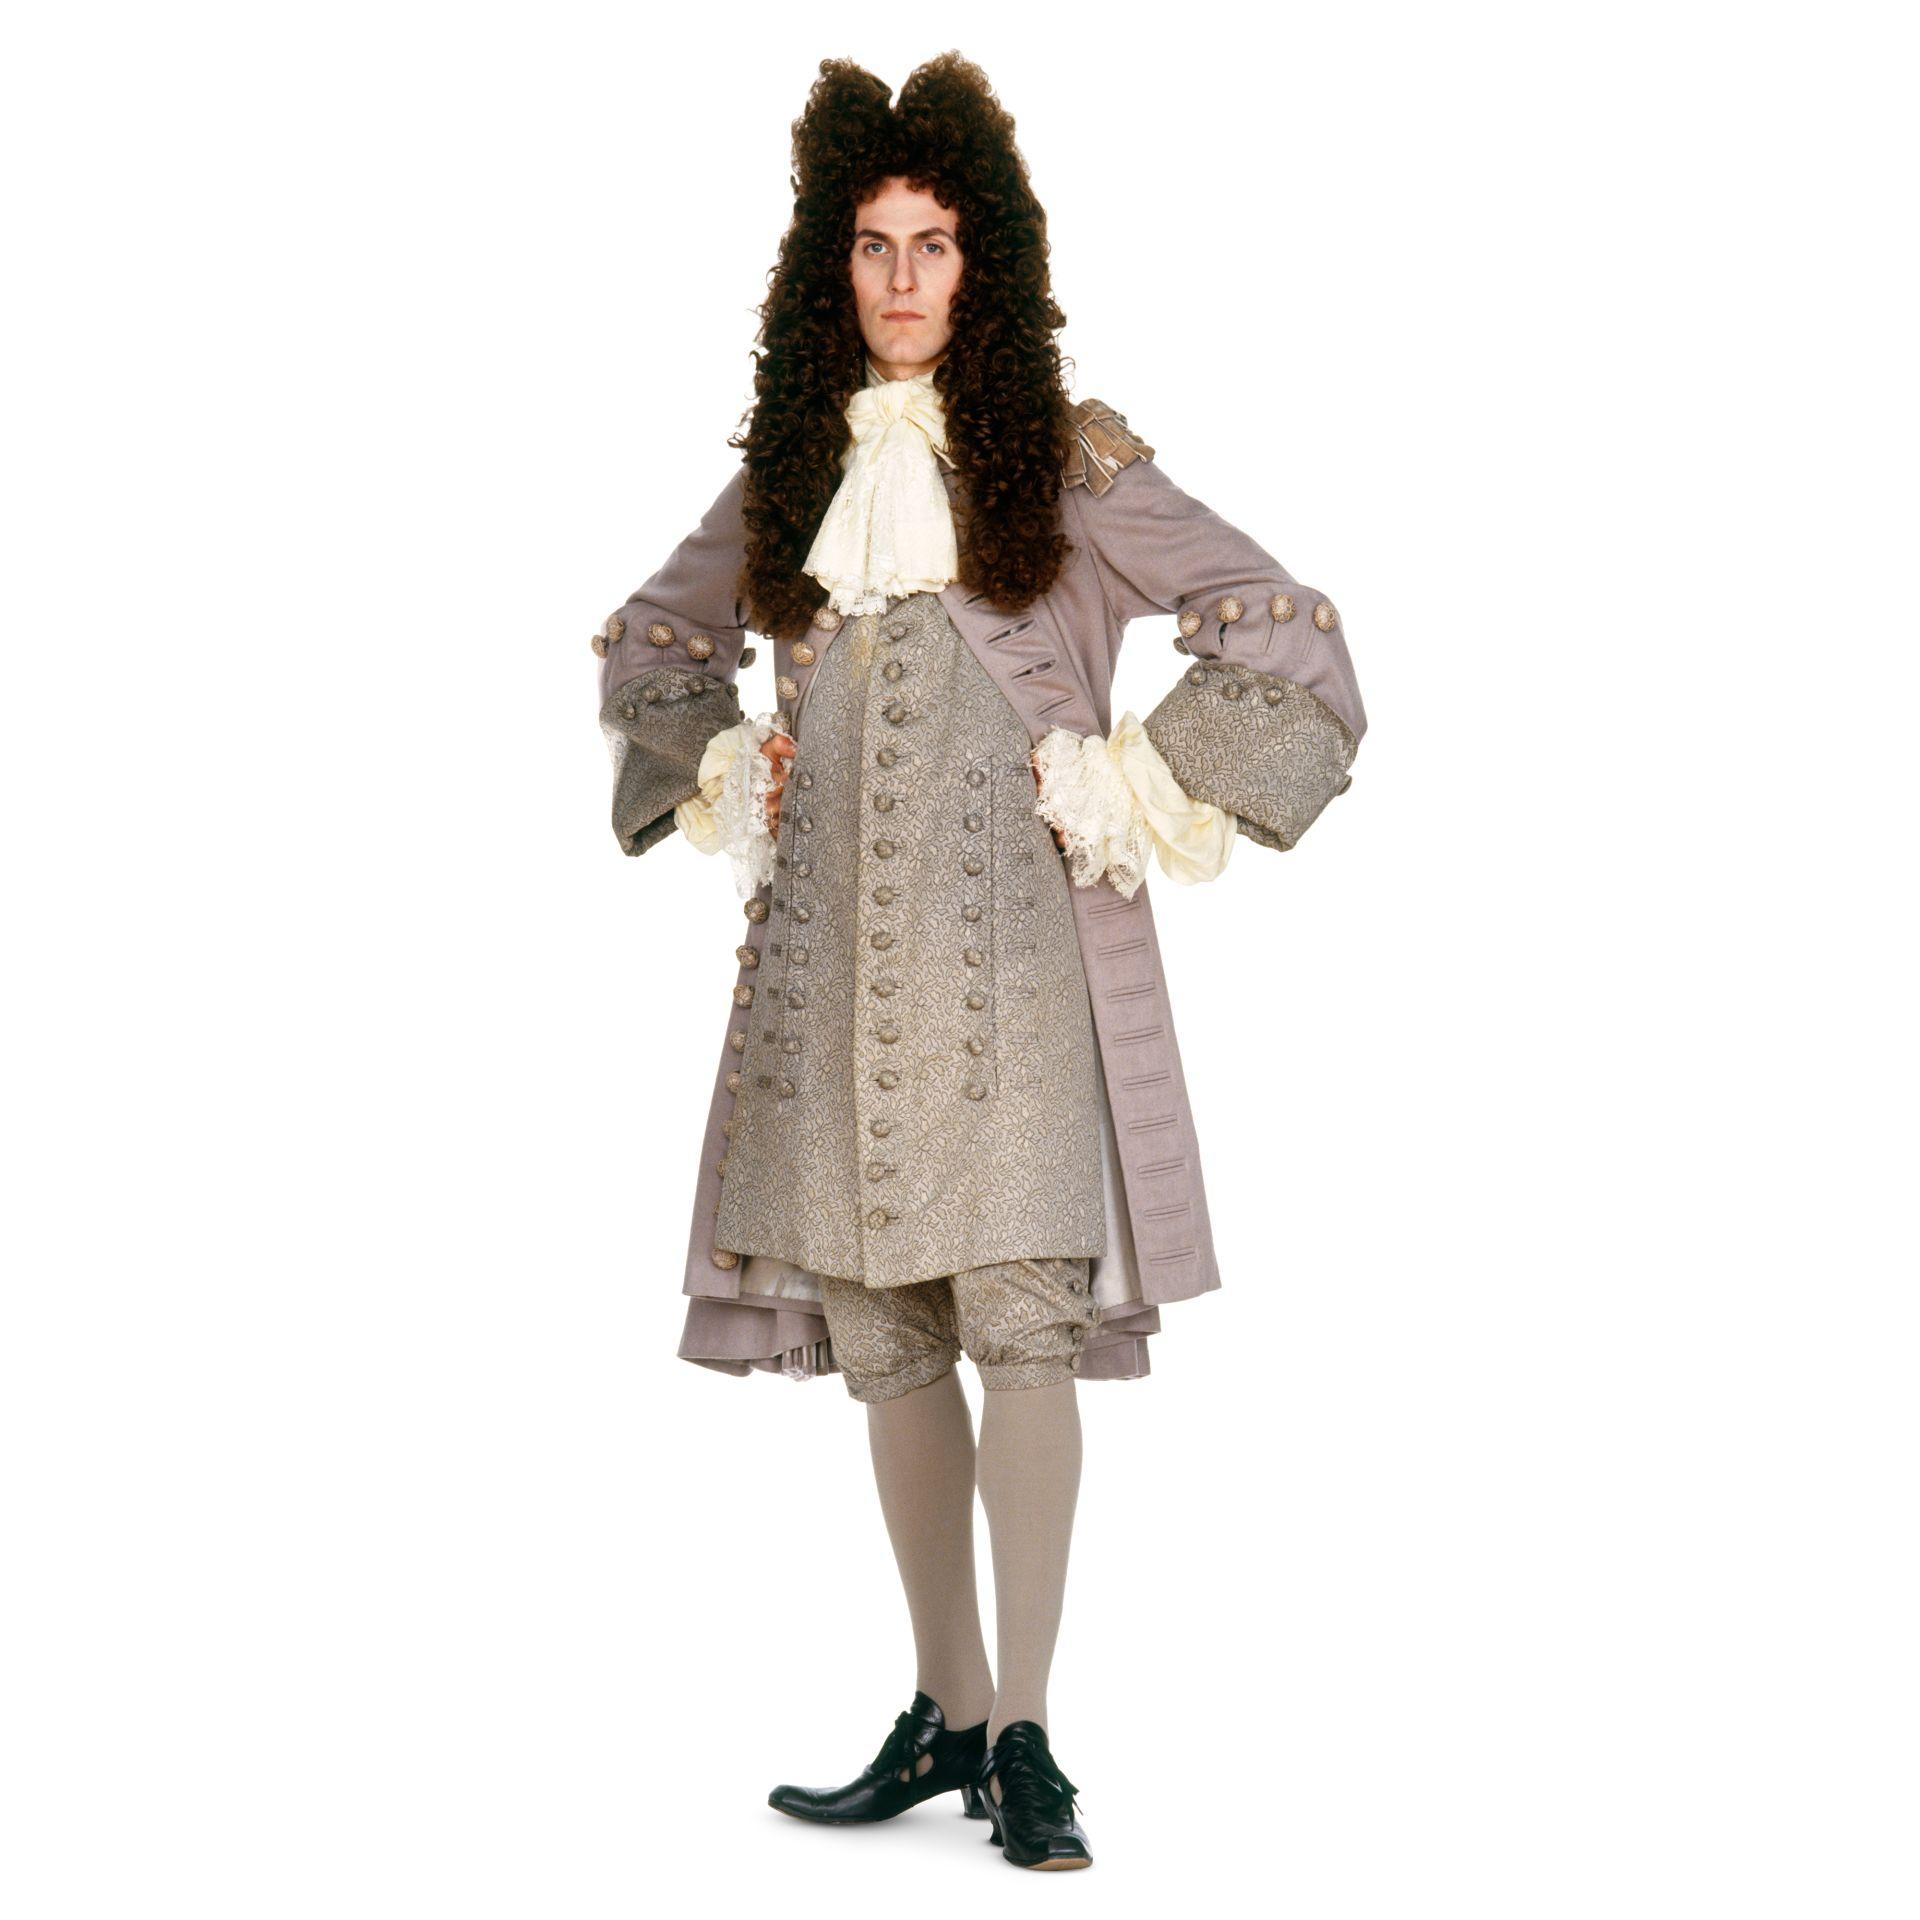 17th century dress style